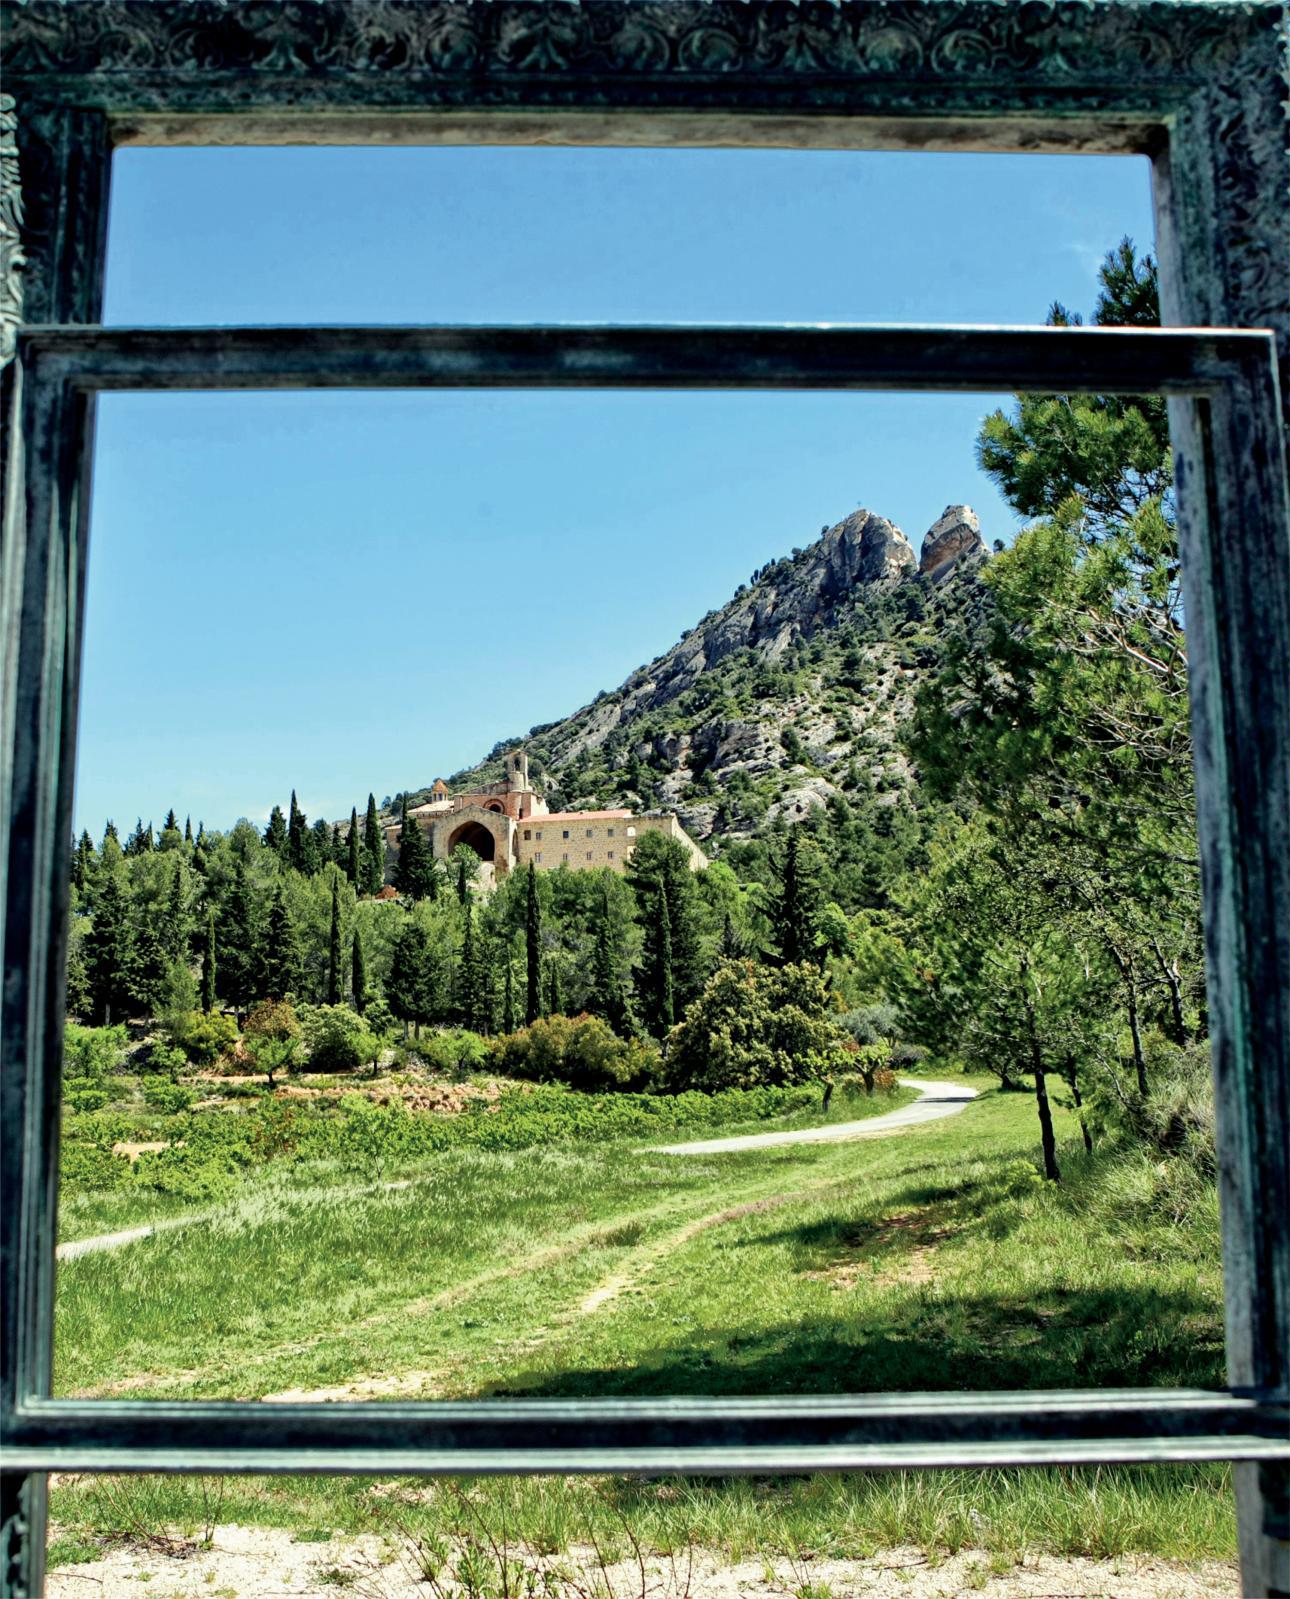 Lieu où Picasso aurait peint Horta de Sant Joan. ©Joan Capdevila